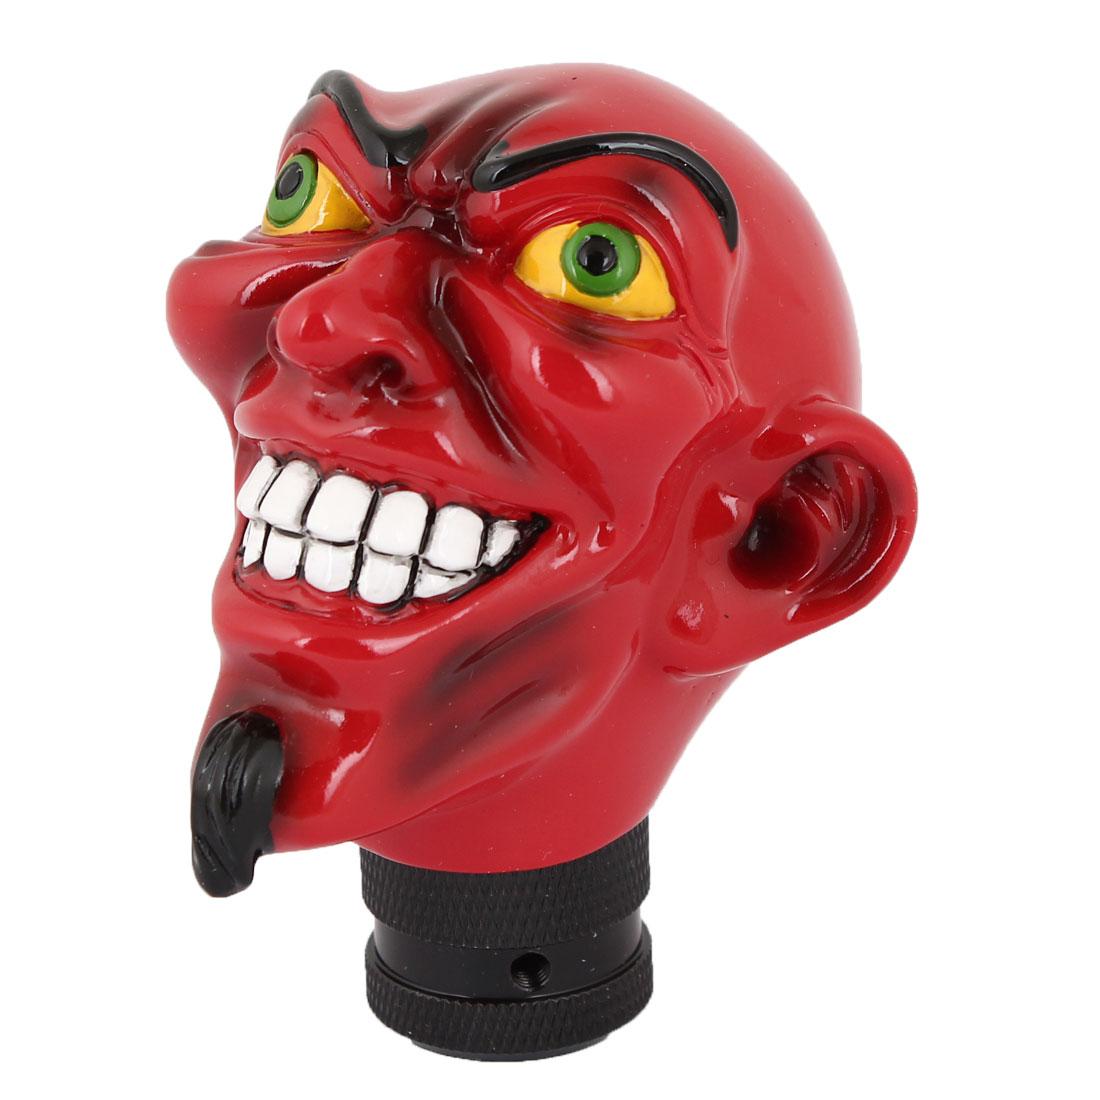 Red Plastic Smiling Face Design Auto Car Gear Stick Shift Knob Shifter Cover